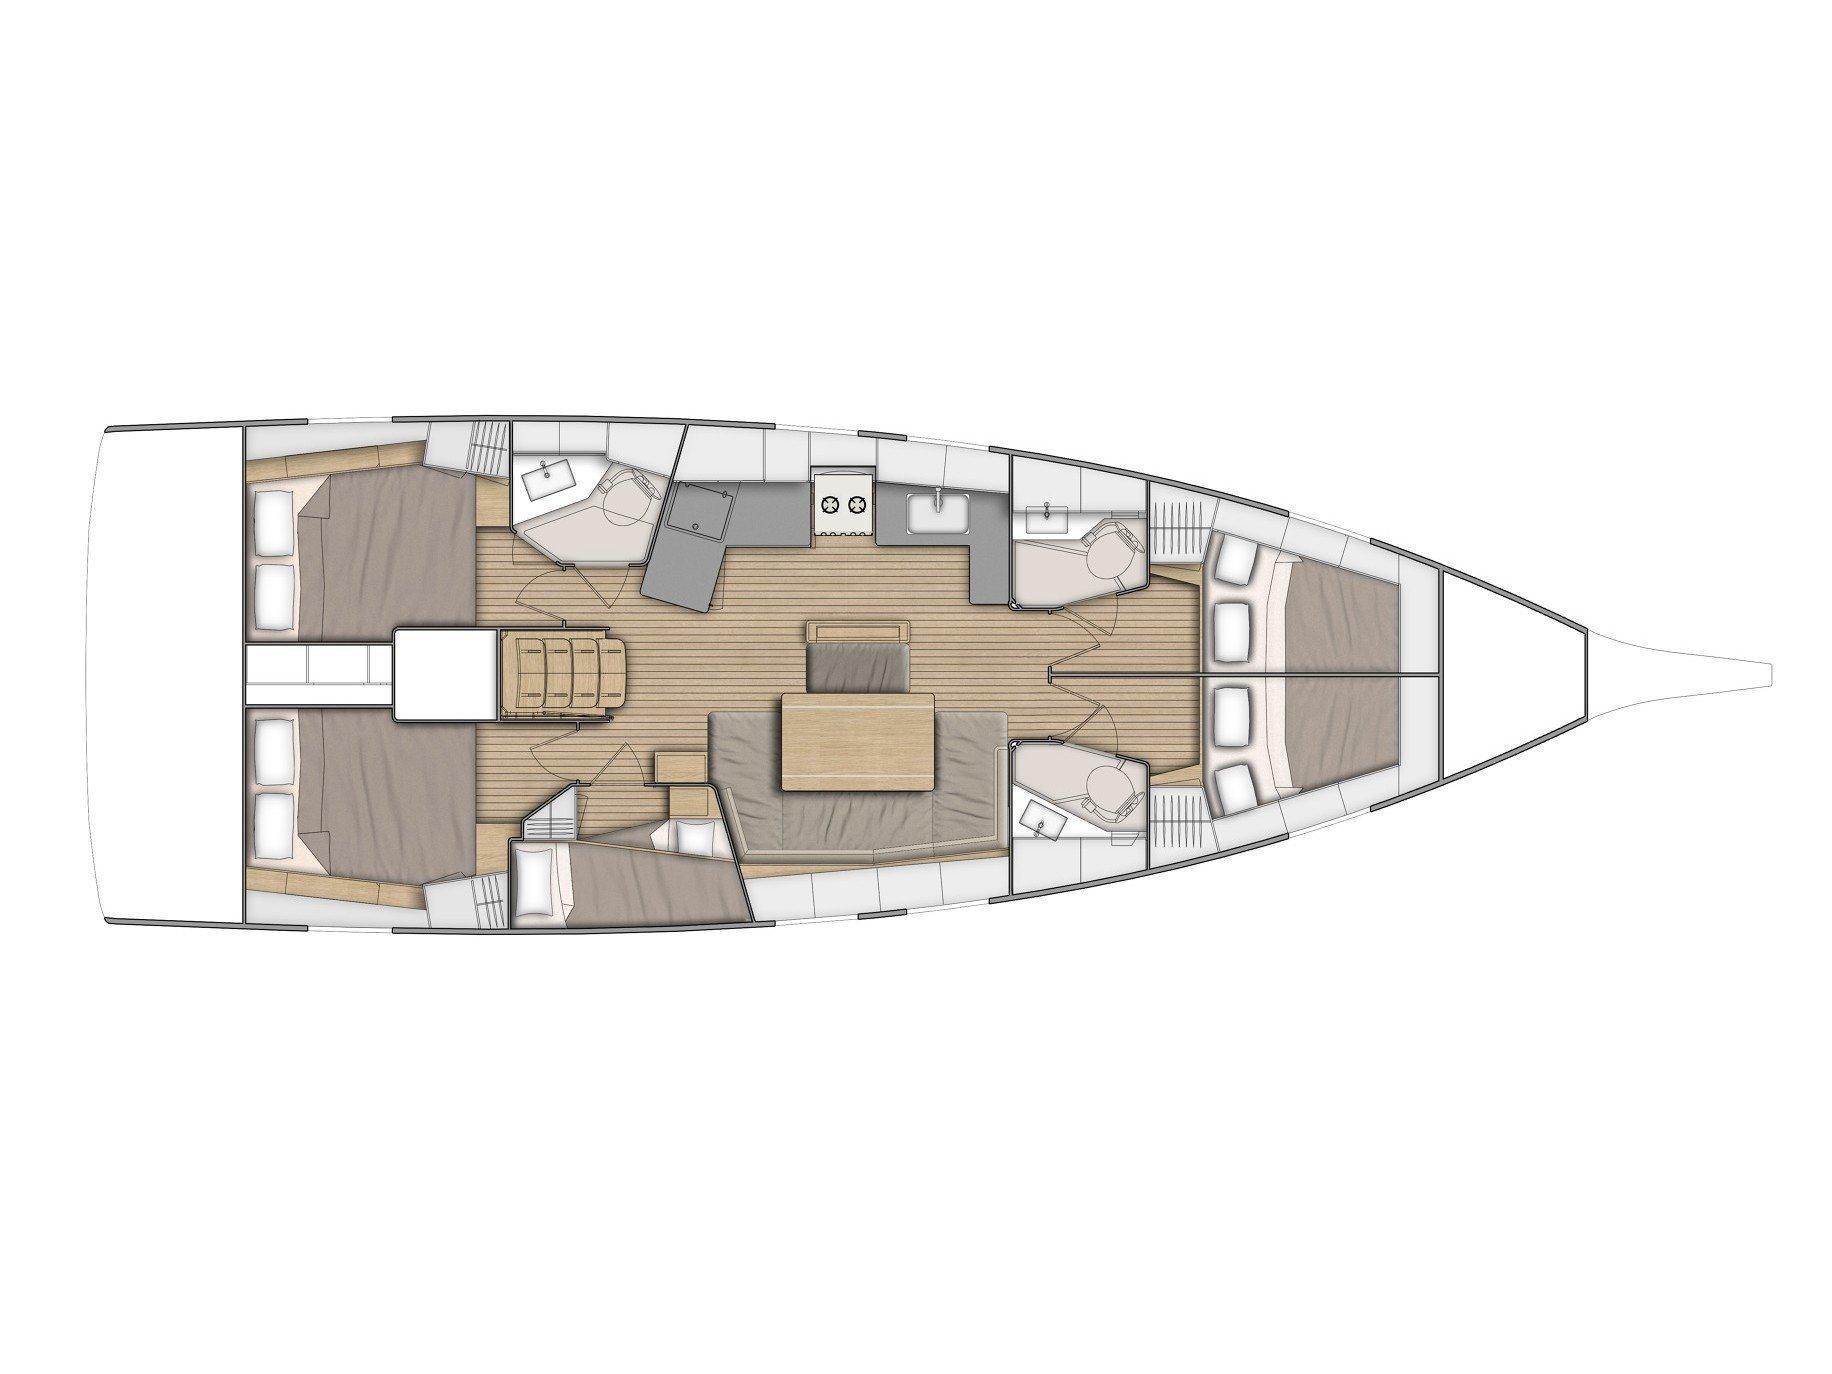 Oceanis 46.1 (AQUALI) Plan image - 21